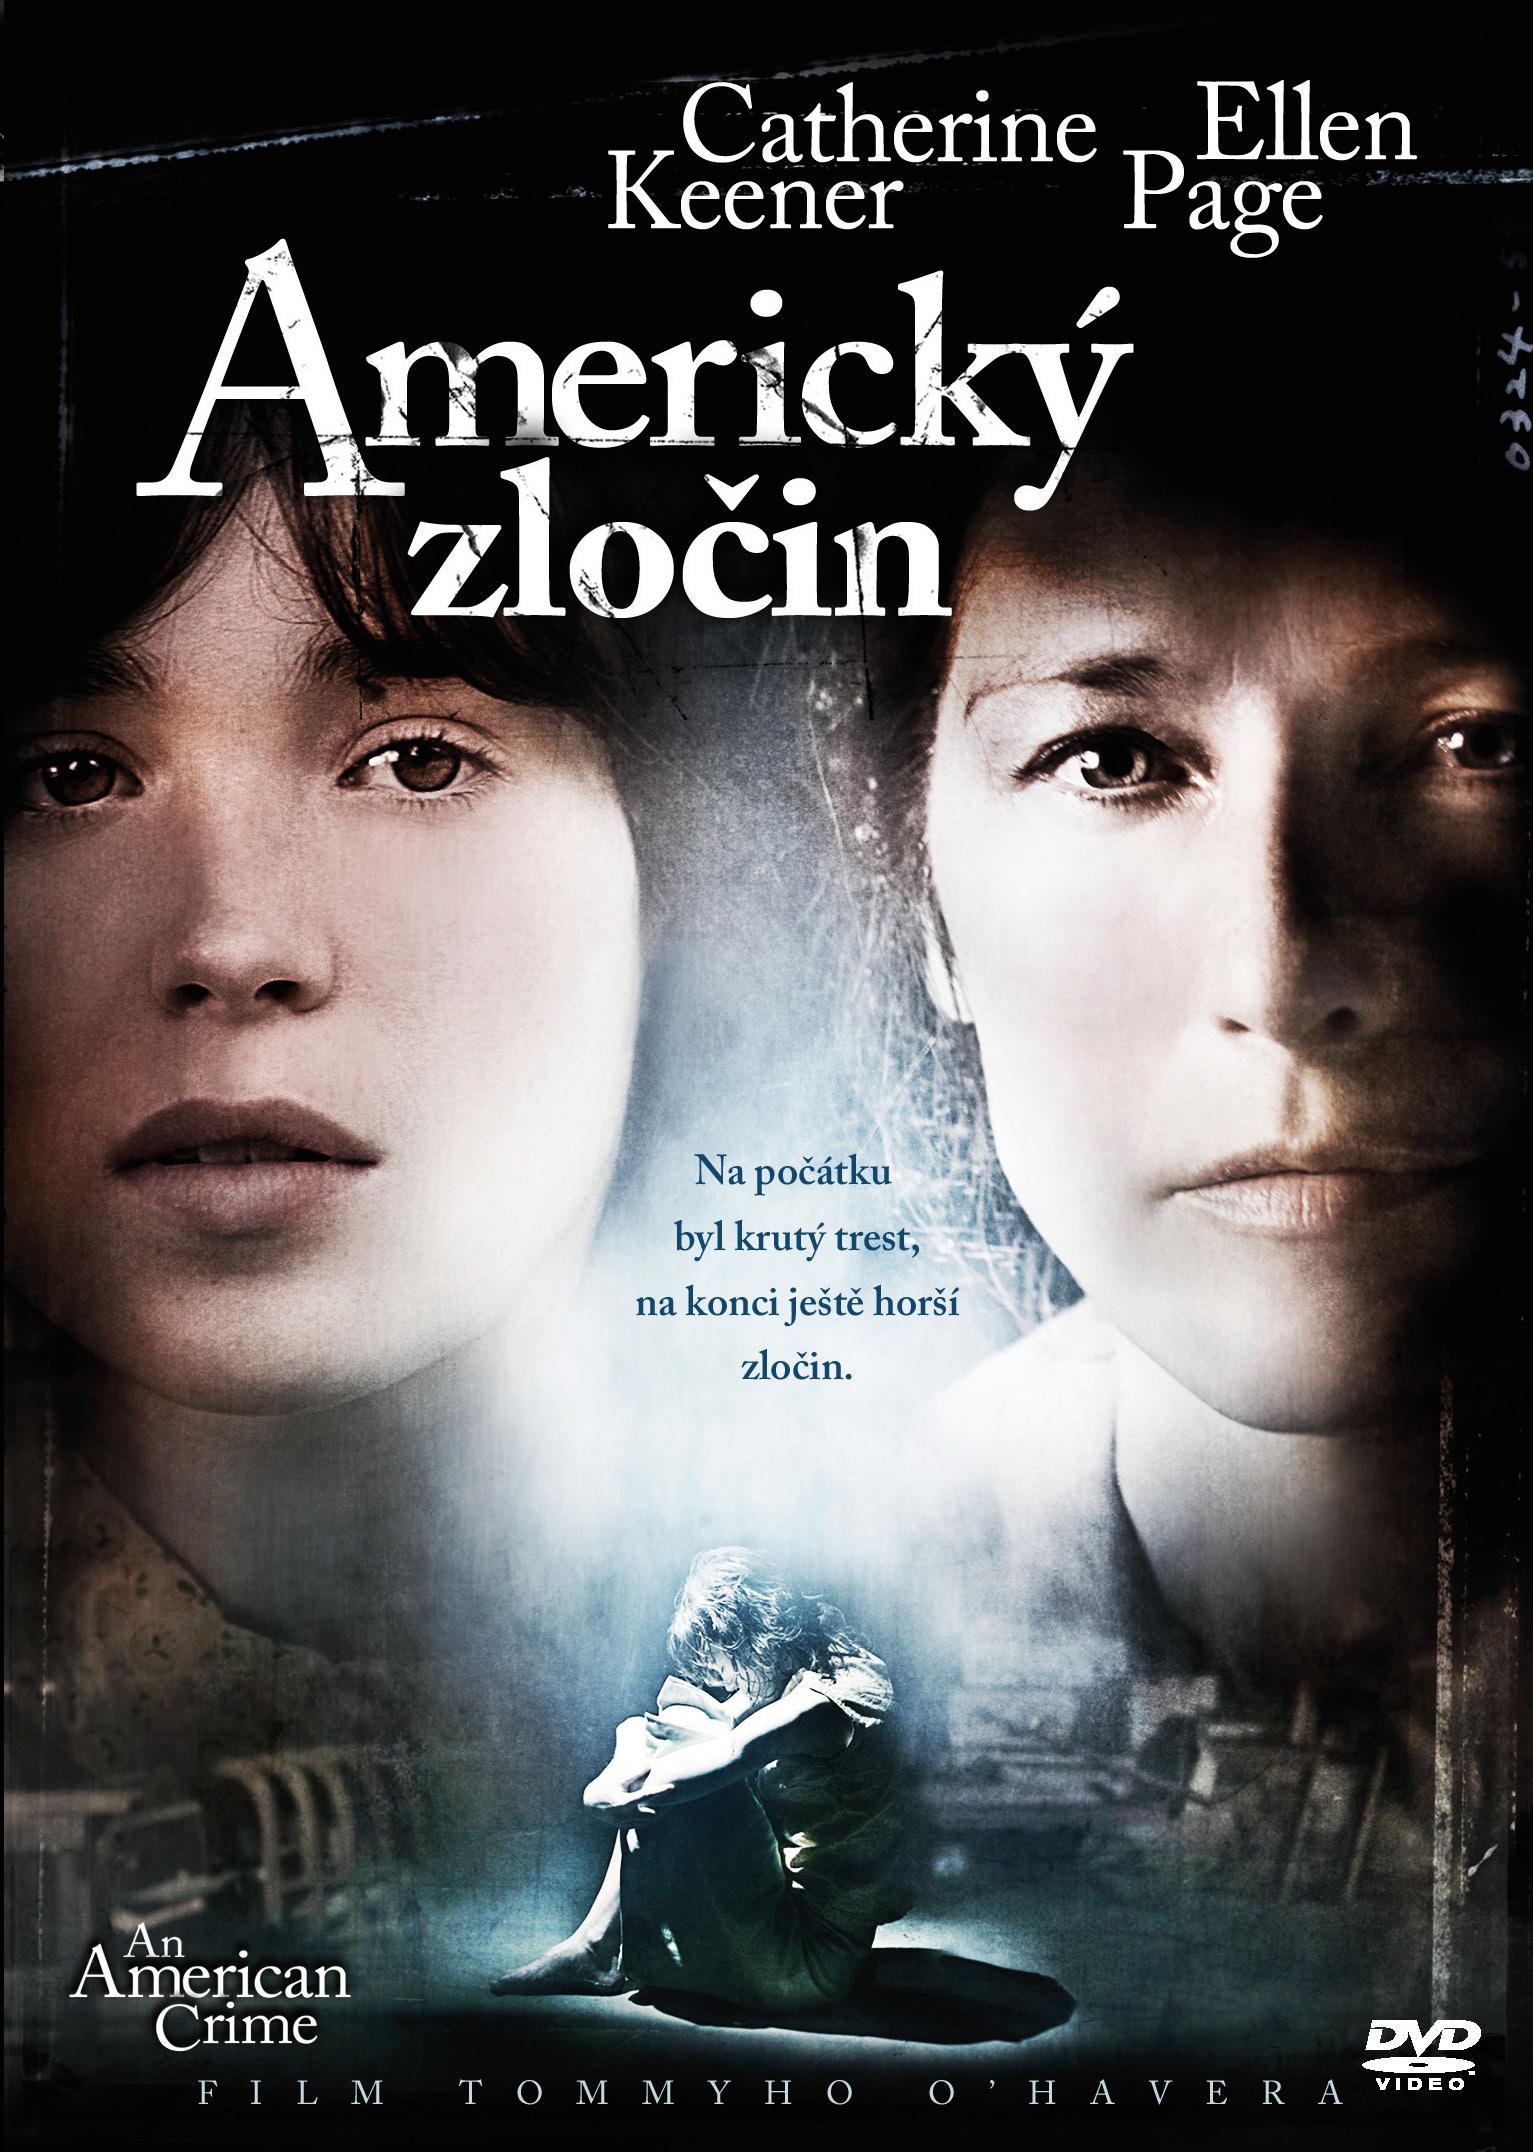 Film Americký zločin ke stažení - Film Americký zločin download